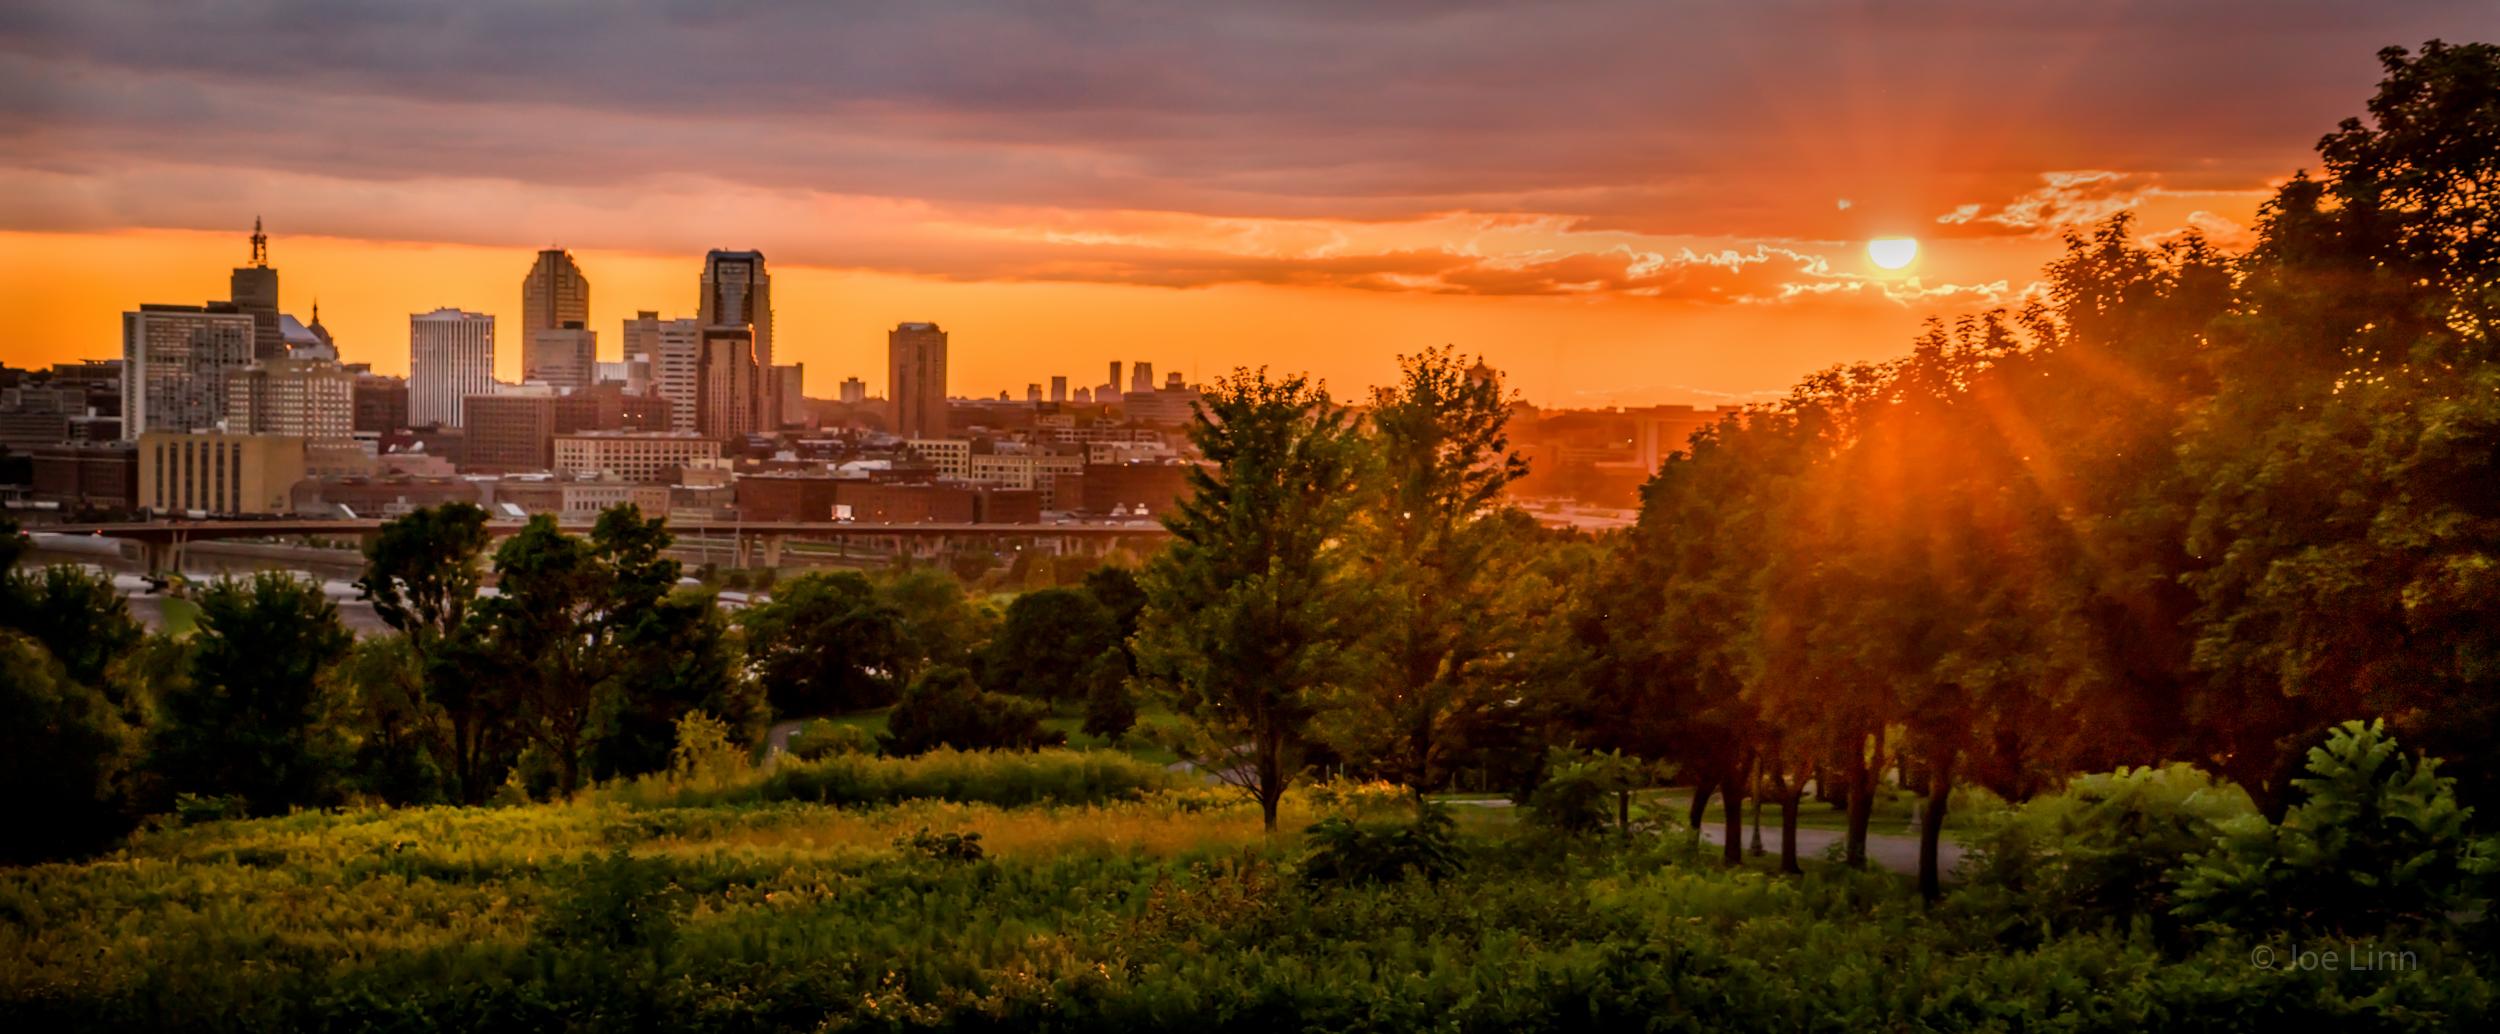 Twin Cities sunset.